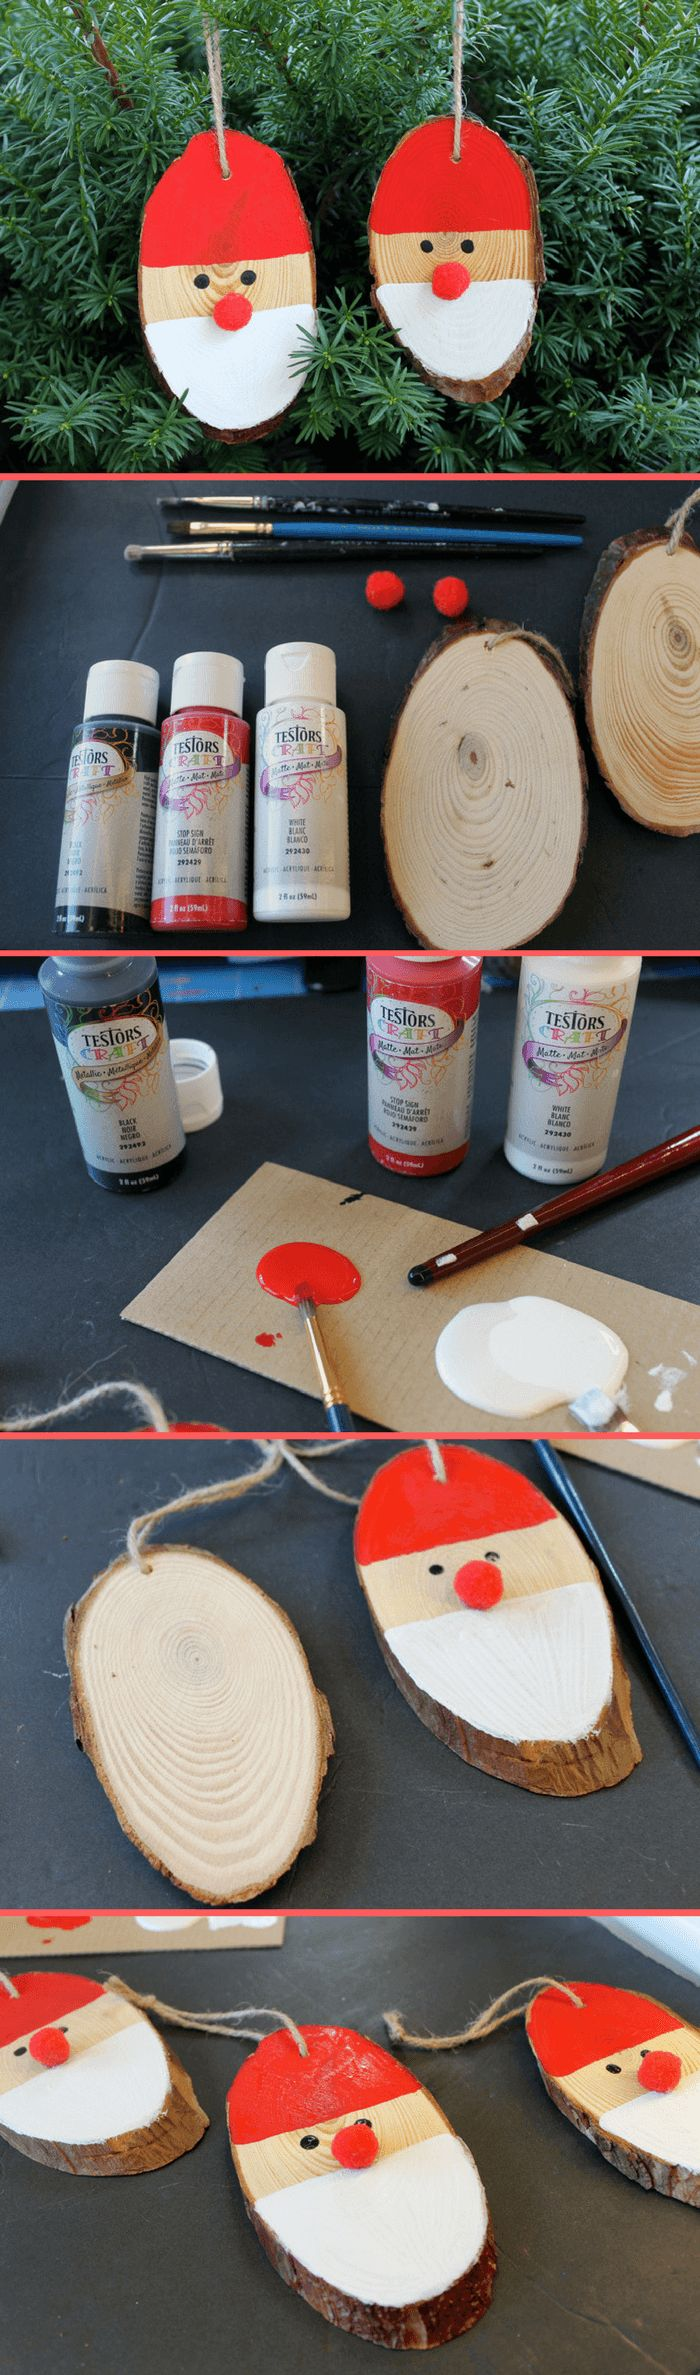 Best 25 staging ideas on pinterest house staging ideas home staging and home staging tips - Decoration de noel a fabriquer ...